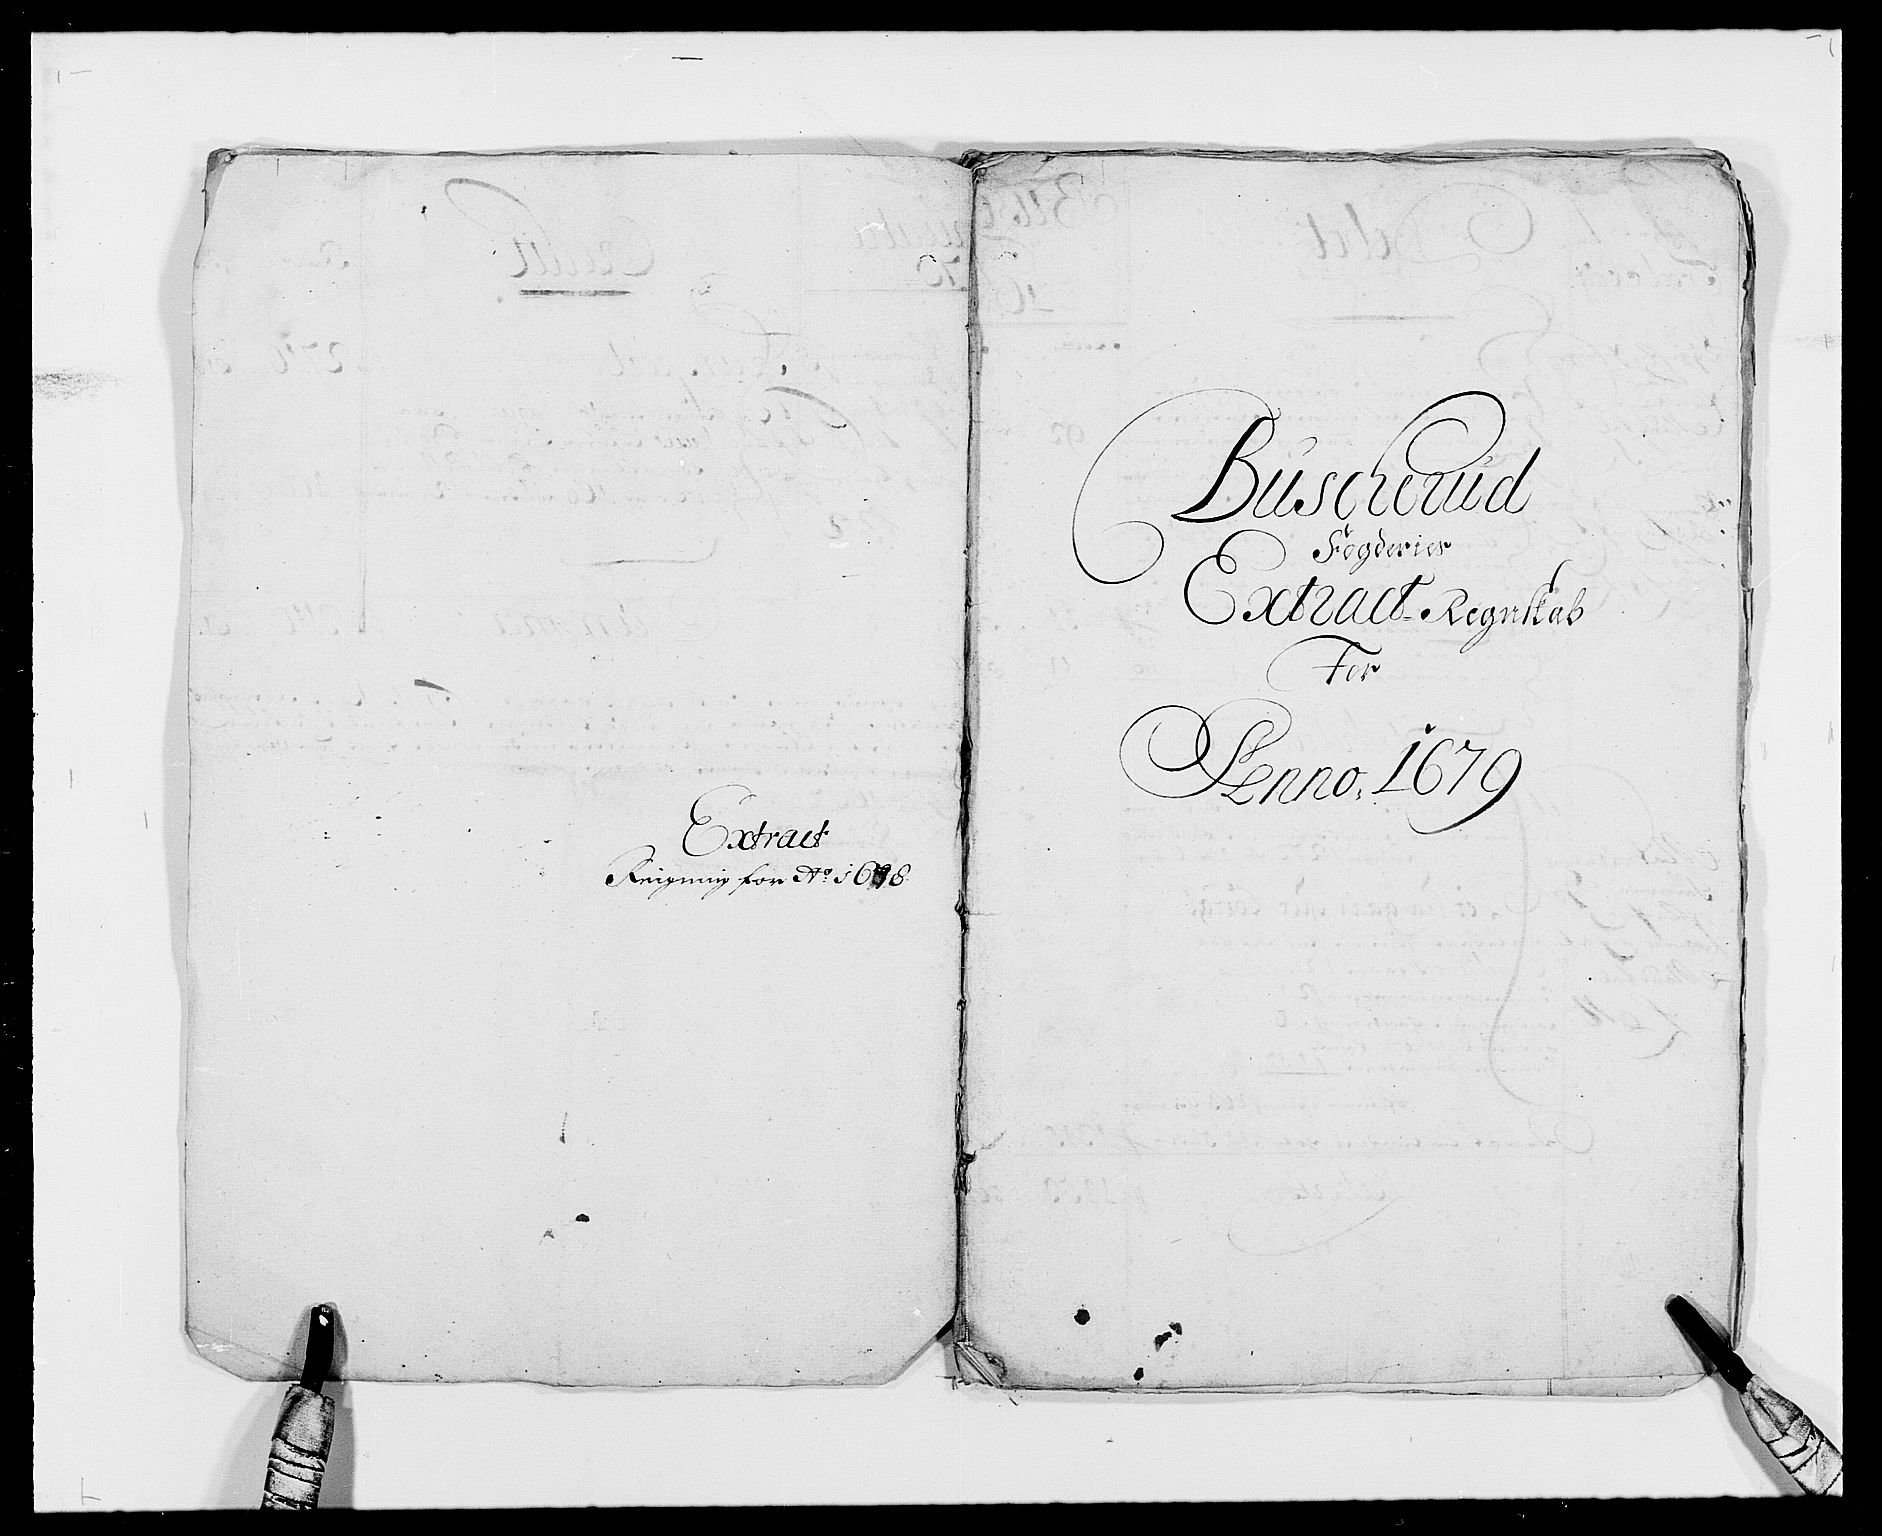 RA, Rentekammeret inntil 1814, Reviderte regnskaper, Fogderegnskap, R25/L1674: Fogderegnskap Buskerud, 1678-1681, s. 6